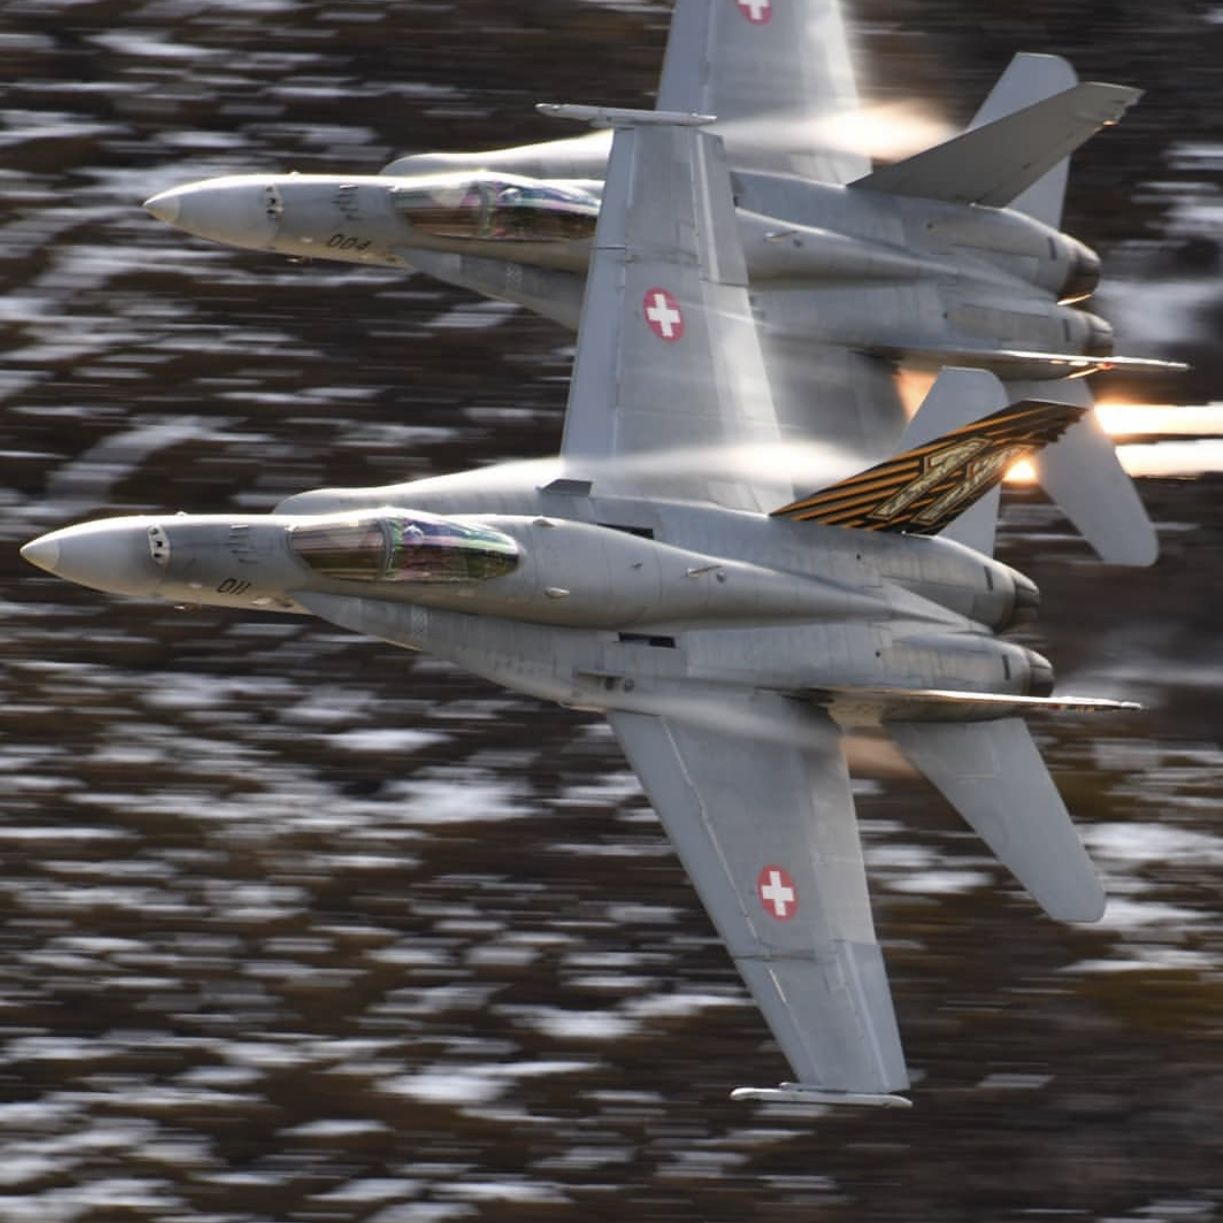 Обои A-10, Hawx, jet. Авиация foto 12